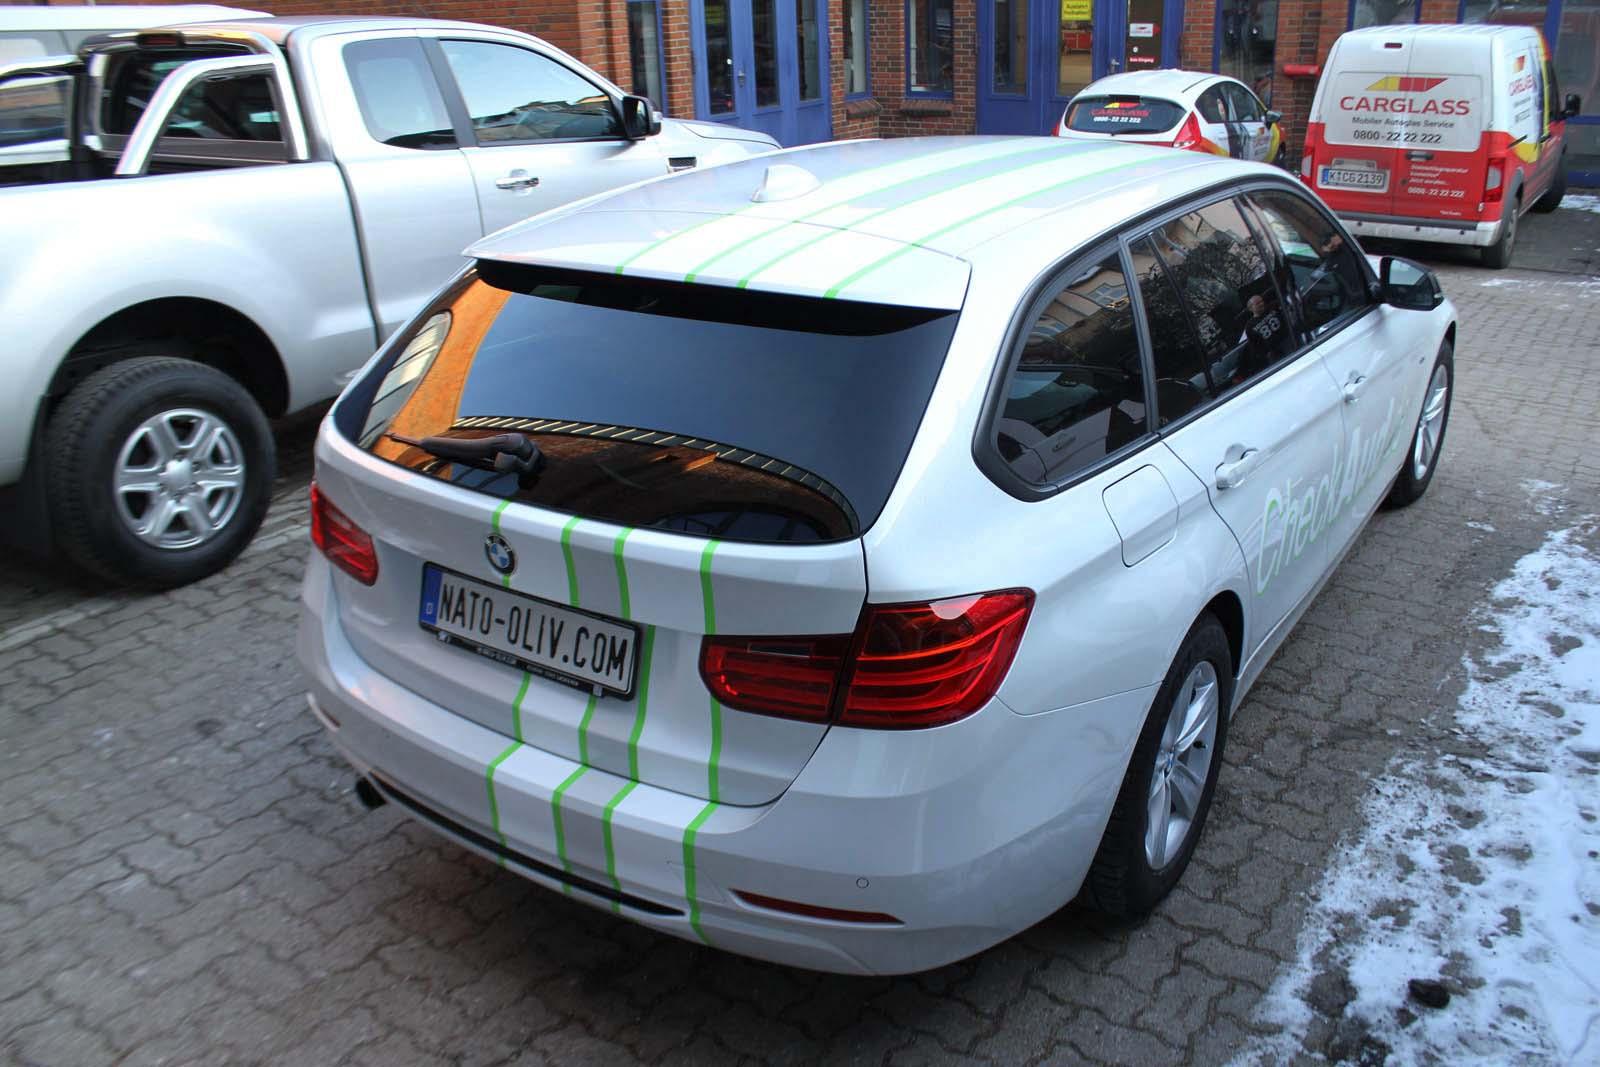 BMW_3ER_RALLYESTREIFEN_WEISS_GRUEN_MATT_MIT_BRANDING_18